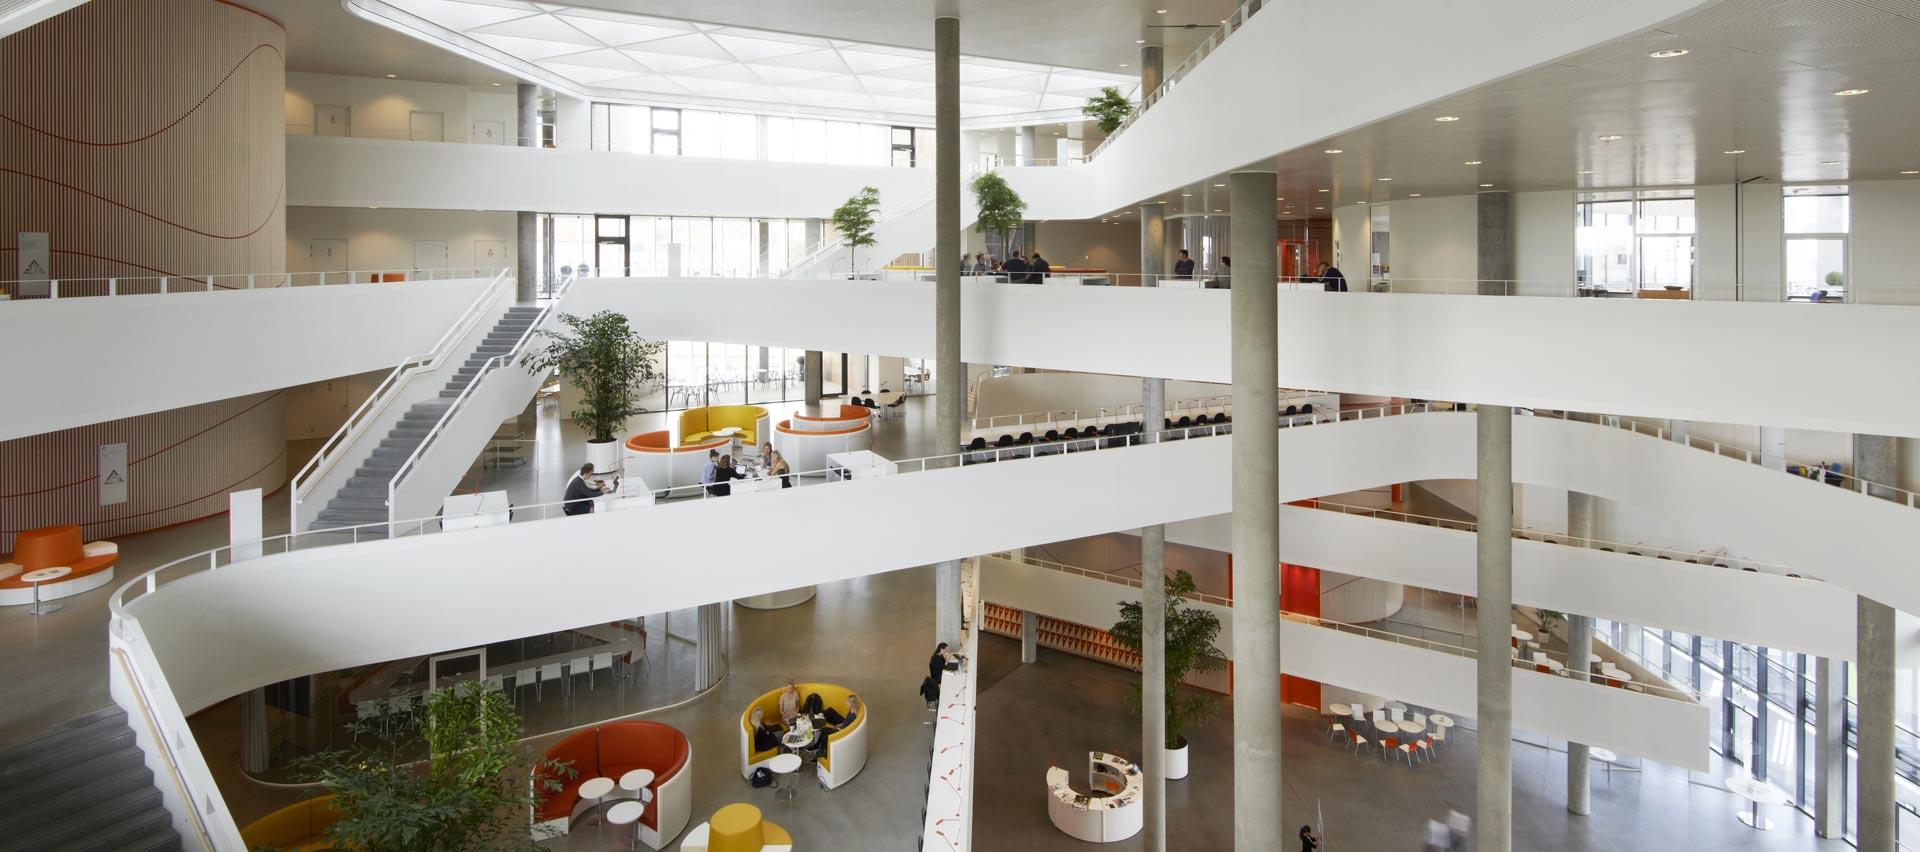 University Of Cincinnati Classroom Design Guide ~ University of cincinnati selects design team for new